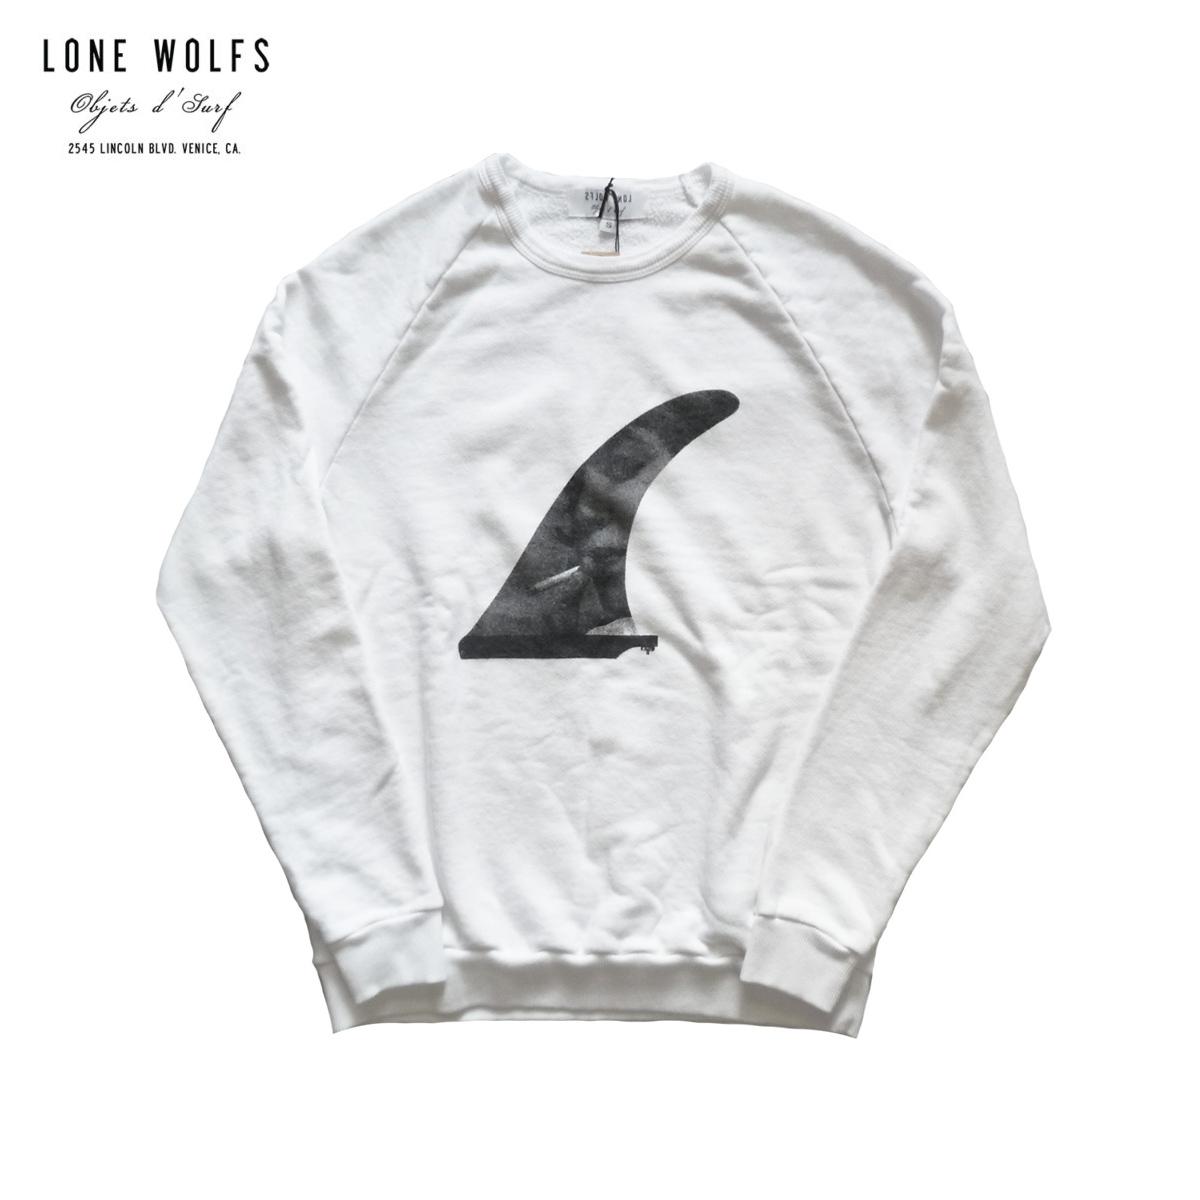 LONE WOLFS ローンウルフズ CREW SWEAT PHOTO FINS メンズ/レディース ホワイト S-L[LONEWOLFS トレーナー 長袖 プリント アメリカ カリフォルニア USA ブランド サーフ アメカジ 白]